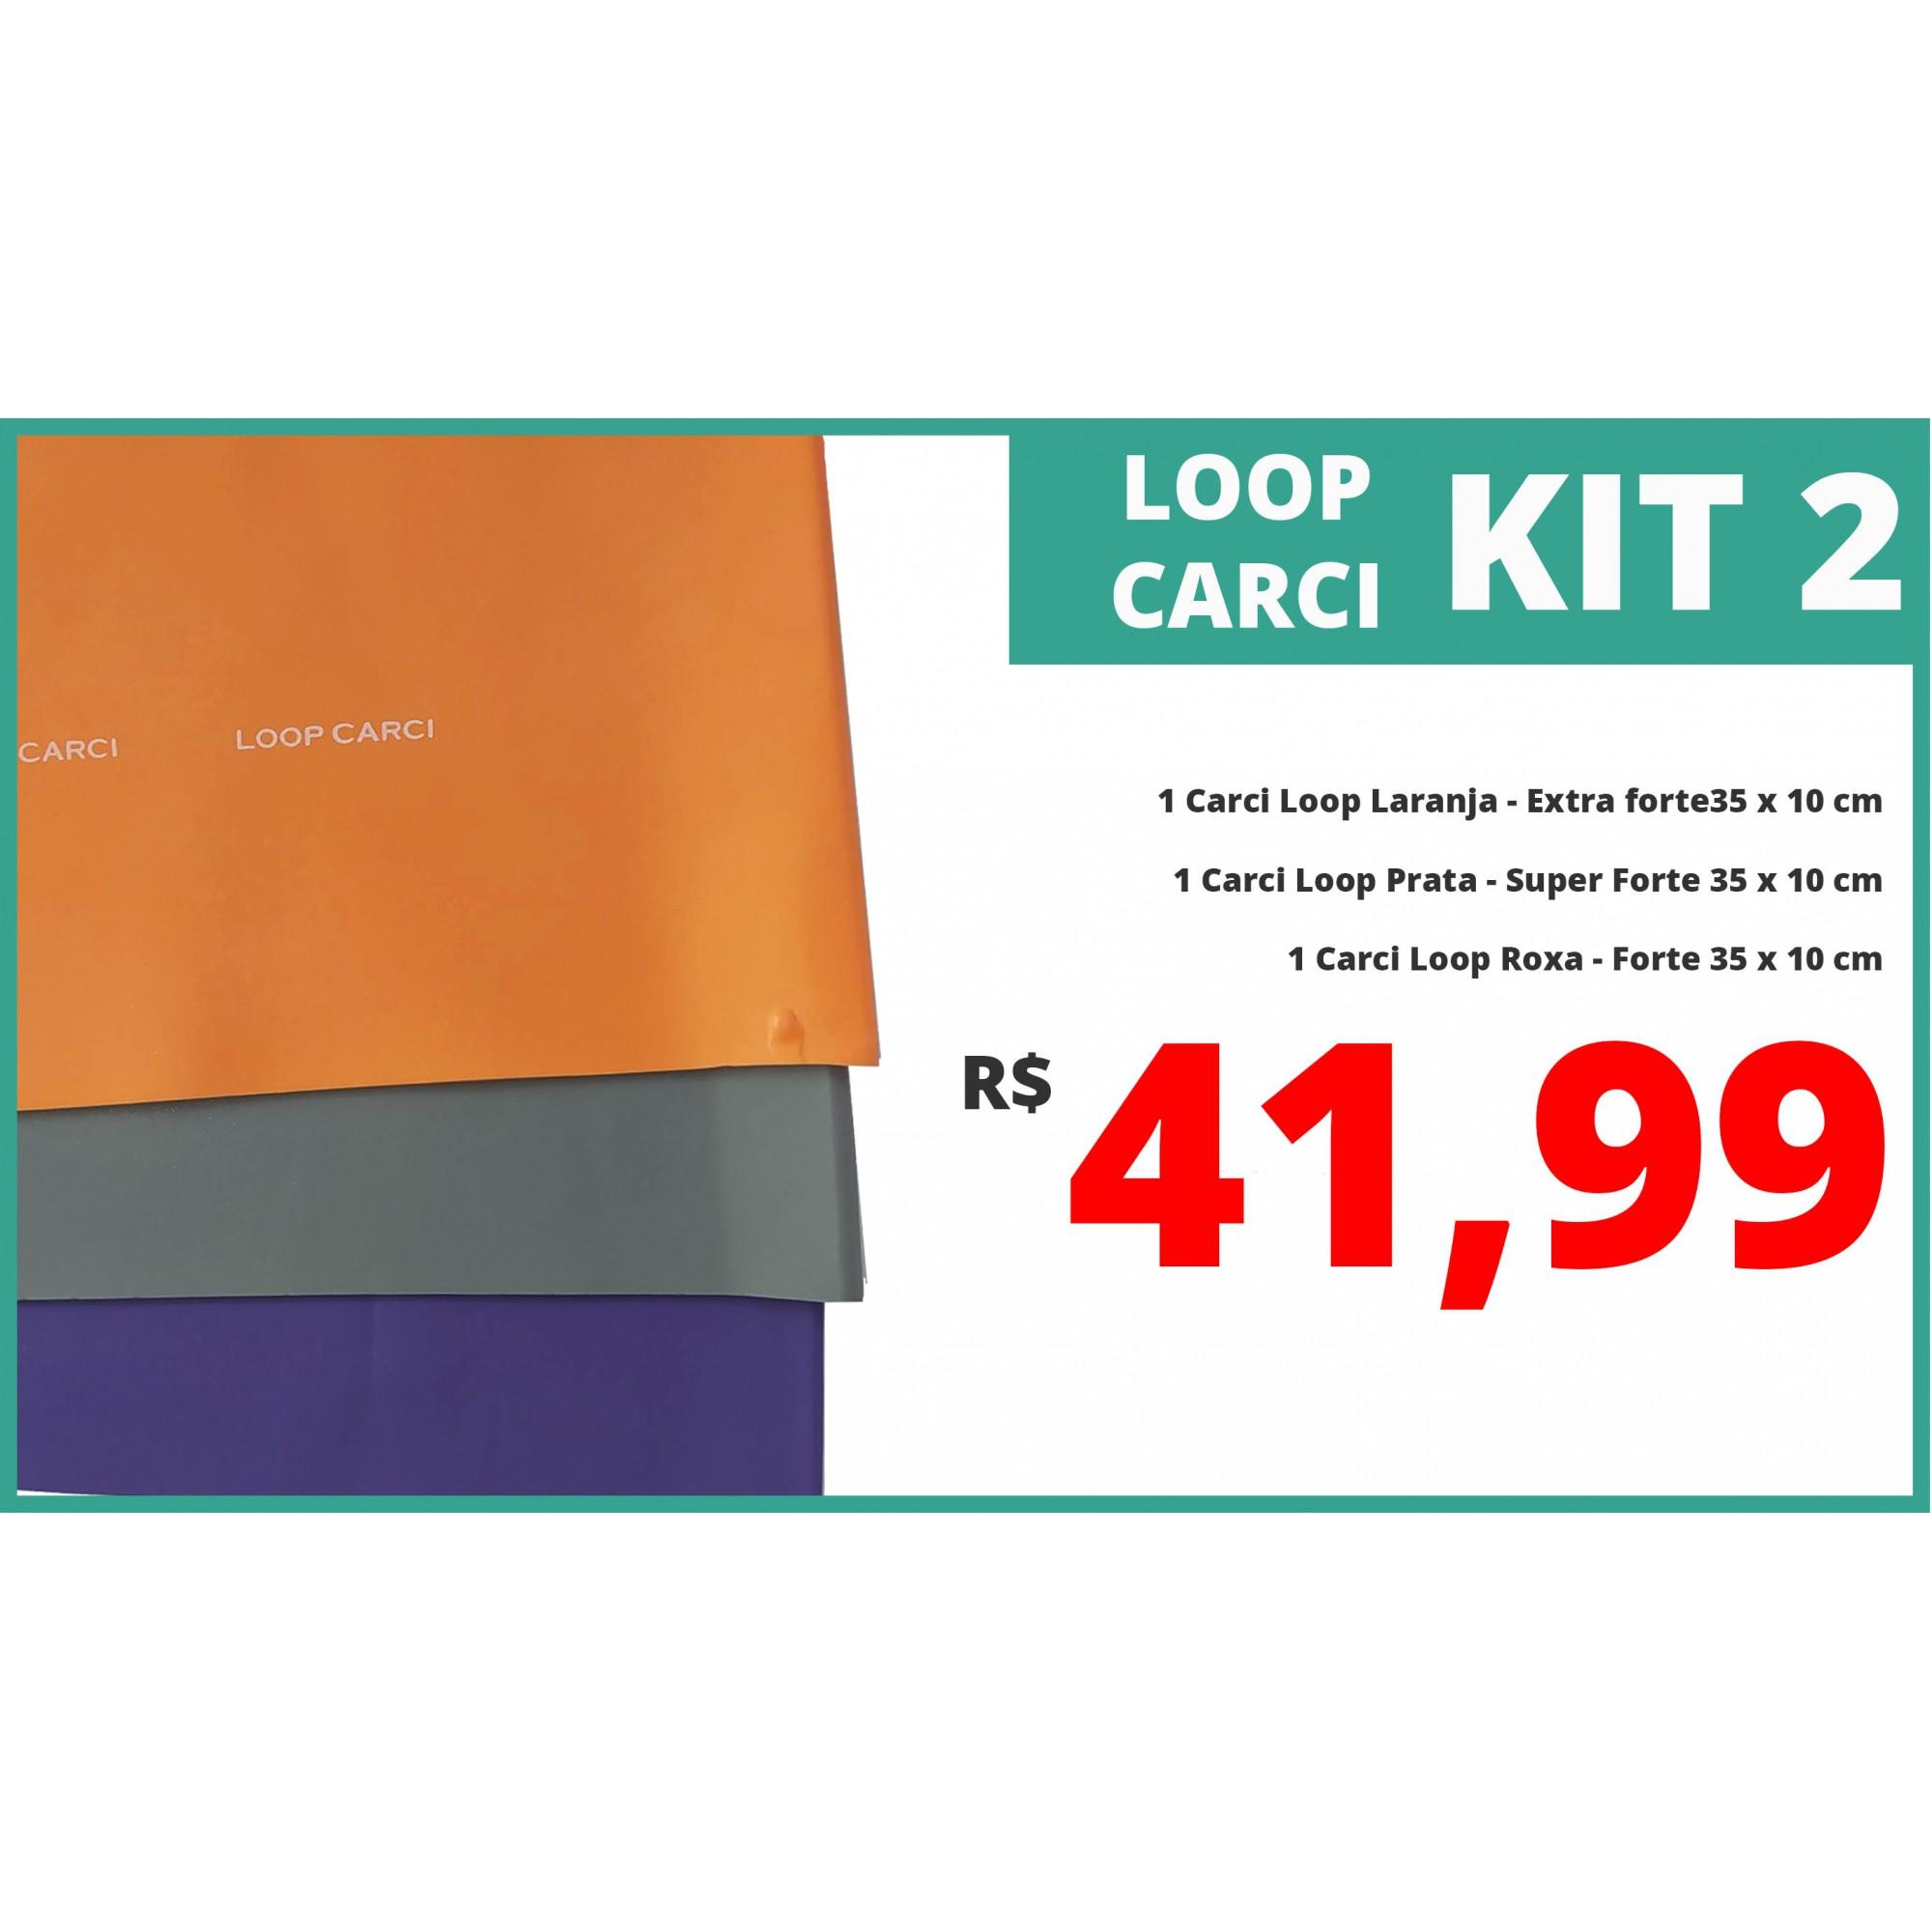 Kit 02 - Carci Loop 35 x 10 cm - ROXA - Forte / PRATA - Super Forte / LARANJA - Extra Forte